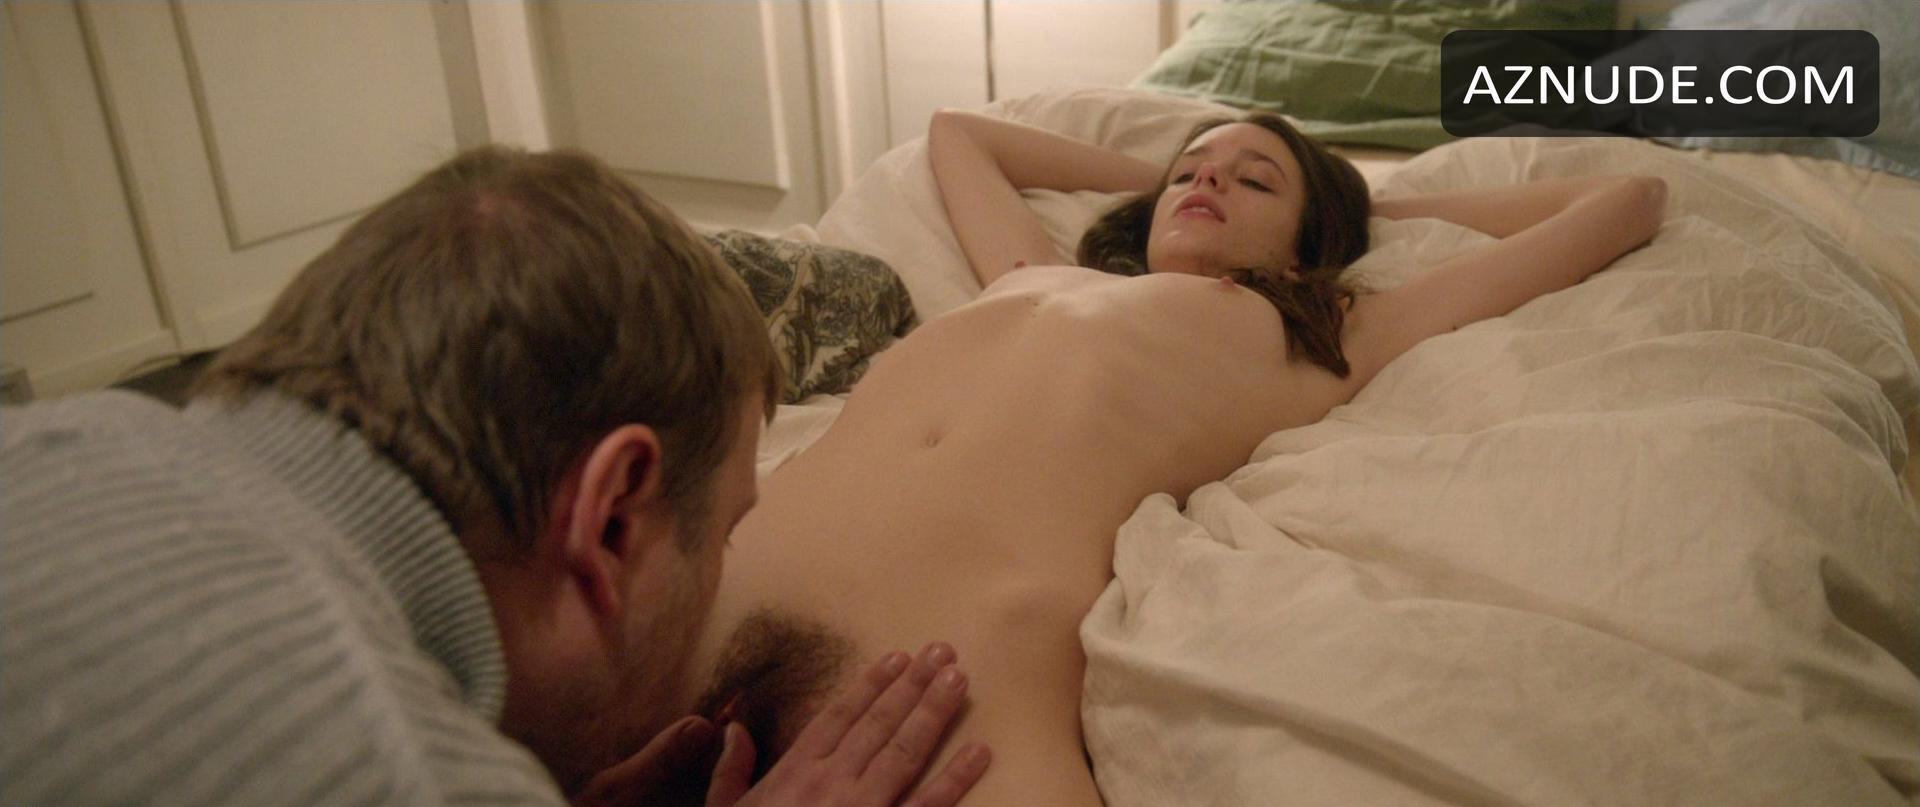 Nymphomaniac Vol I Nude Scenes - Aznude-4407